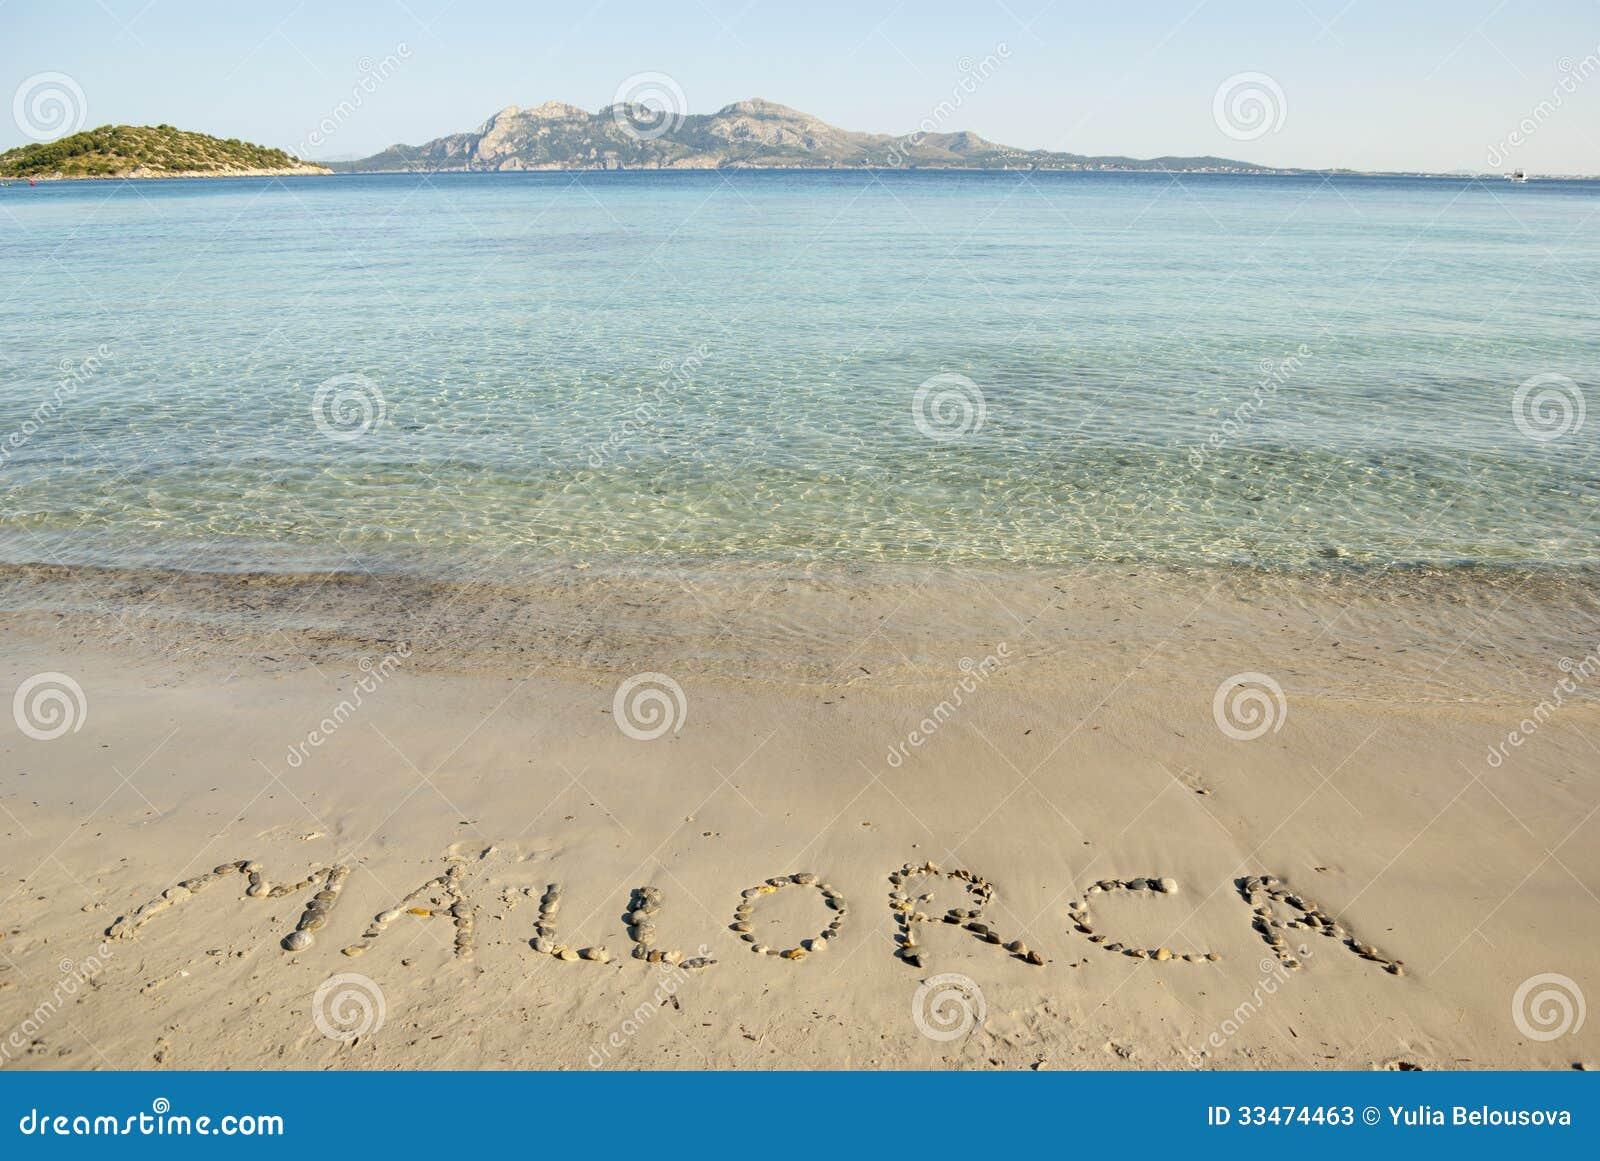 Надпись на пляже